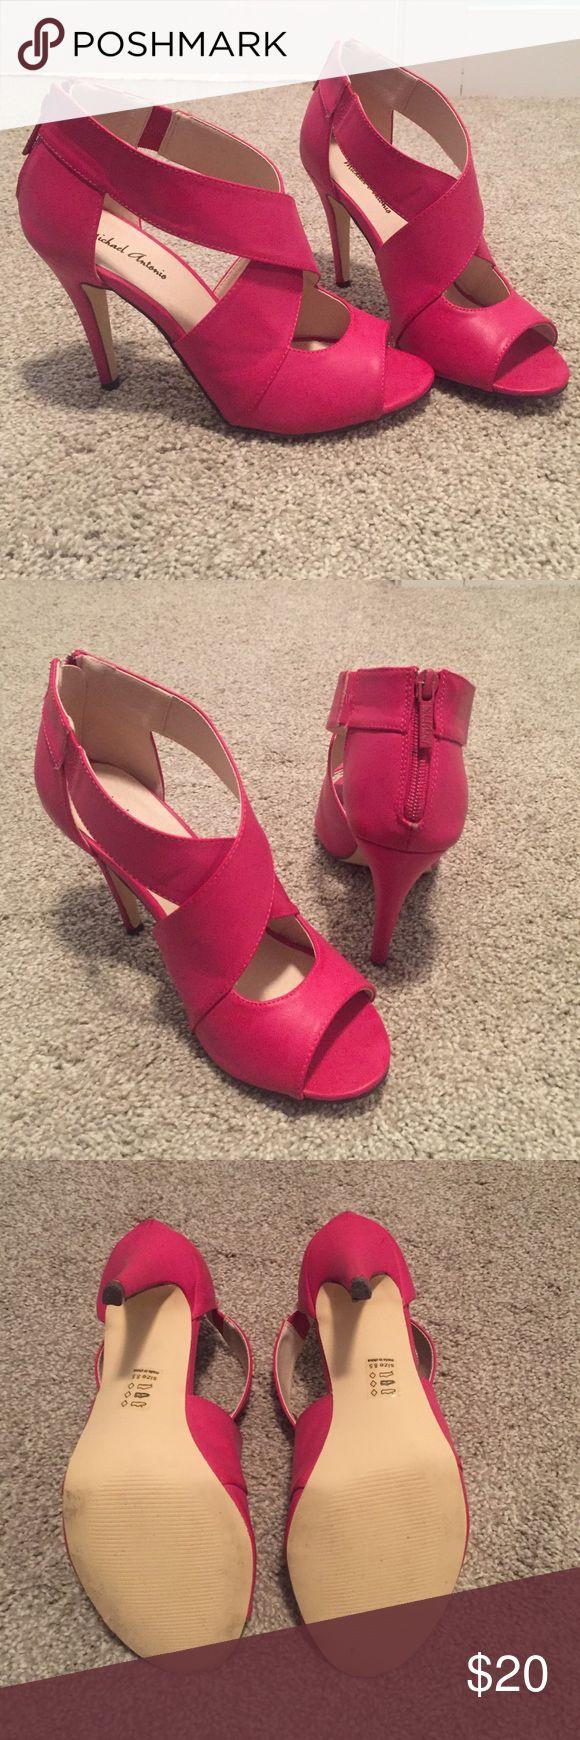 "Michael Antonio Pink Strappy Heels Bright pink strappy heels. Back zipper with a 4"" heel. Lightly worn. Michael Antonio Shoes Heels"